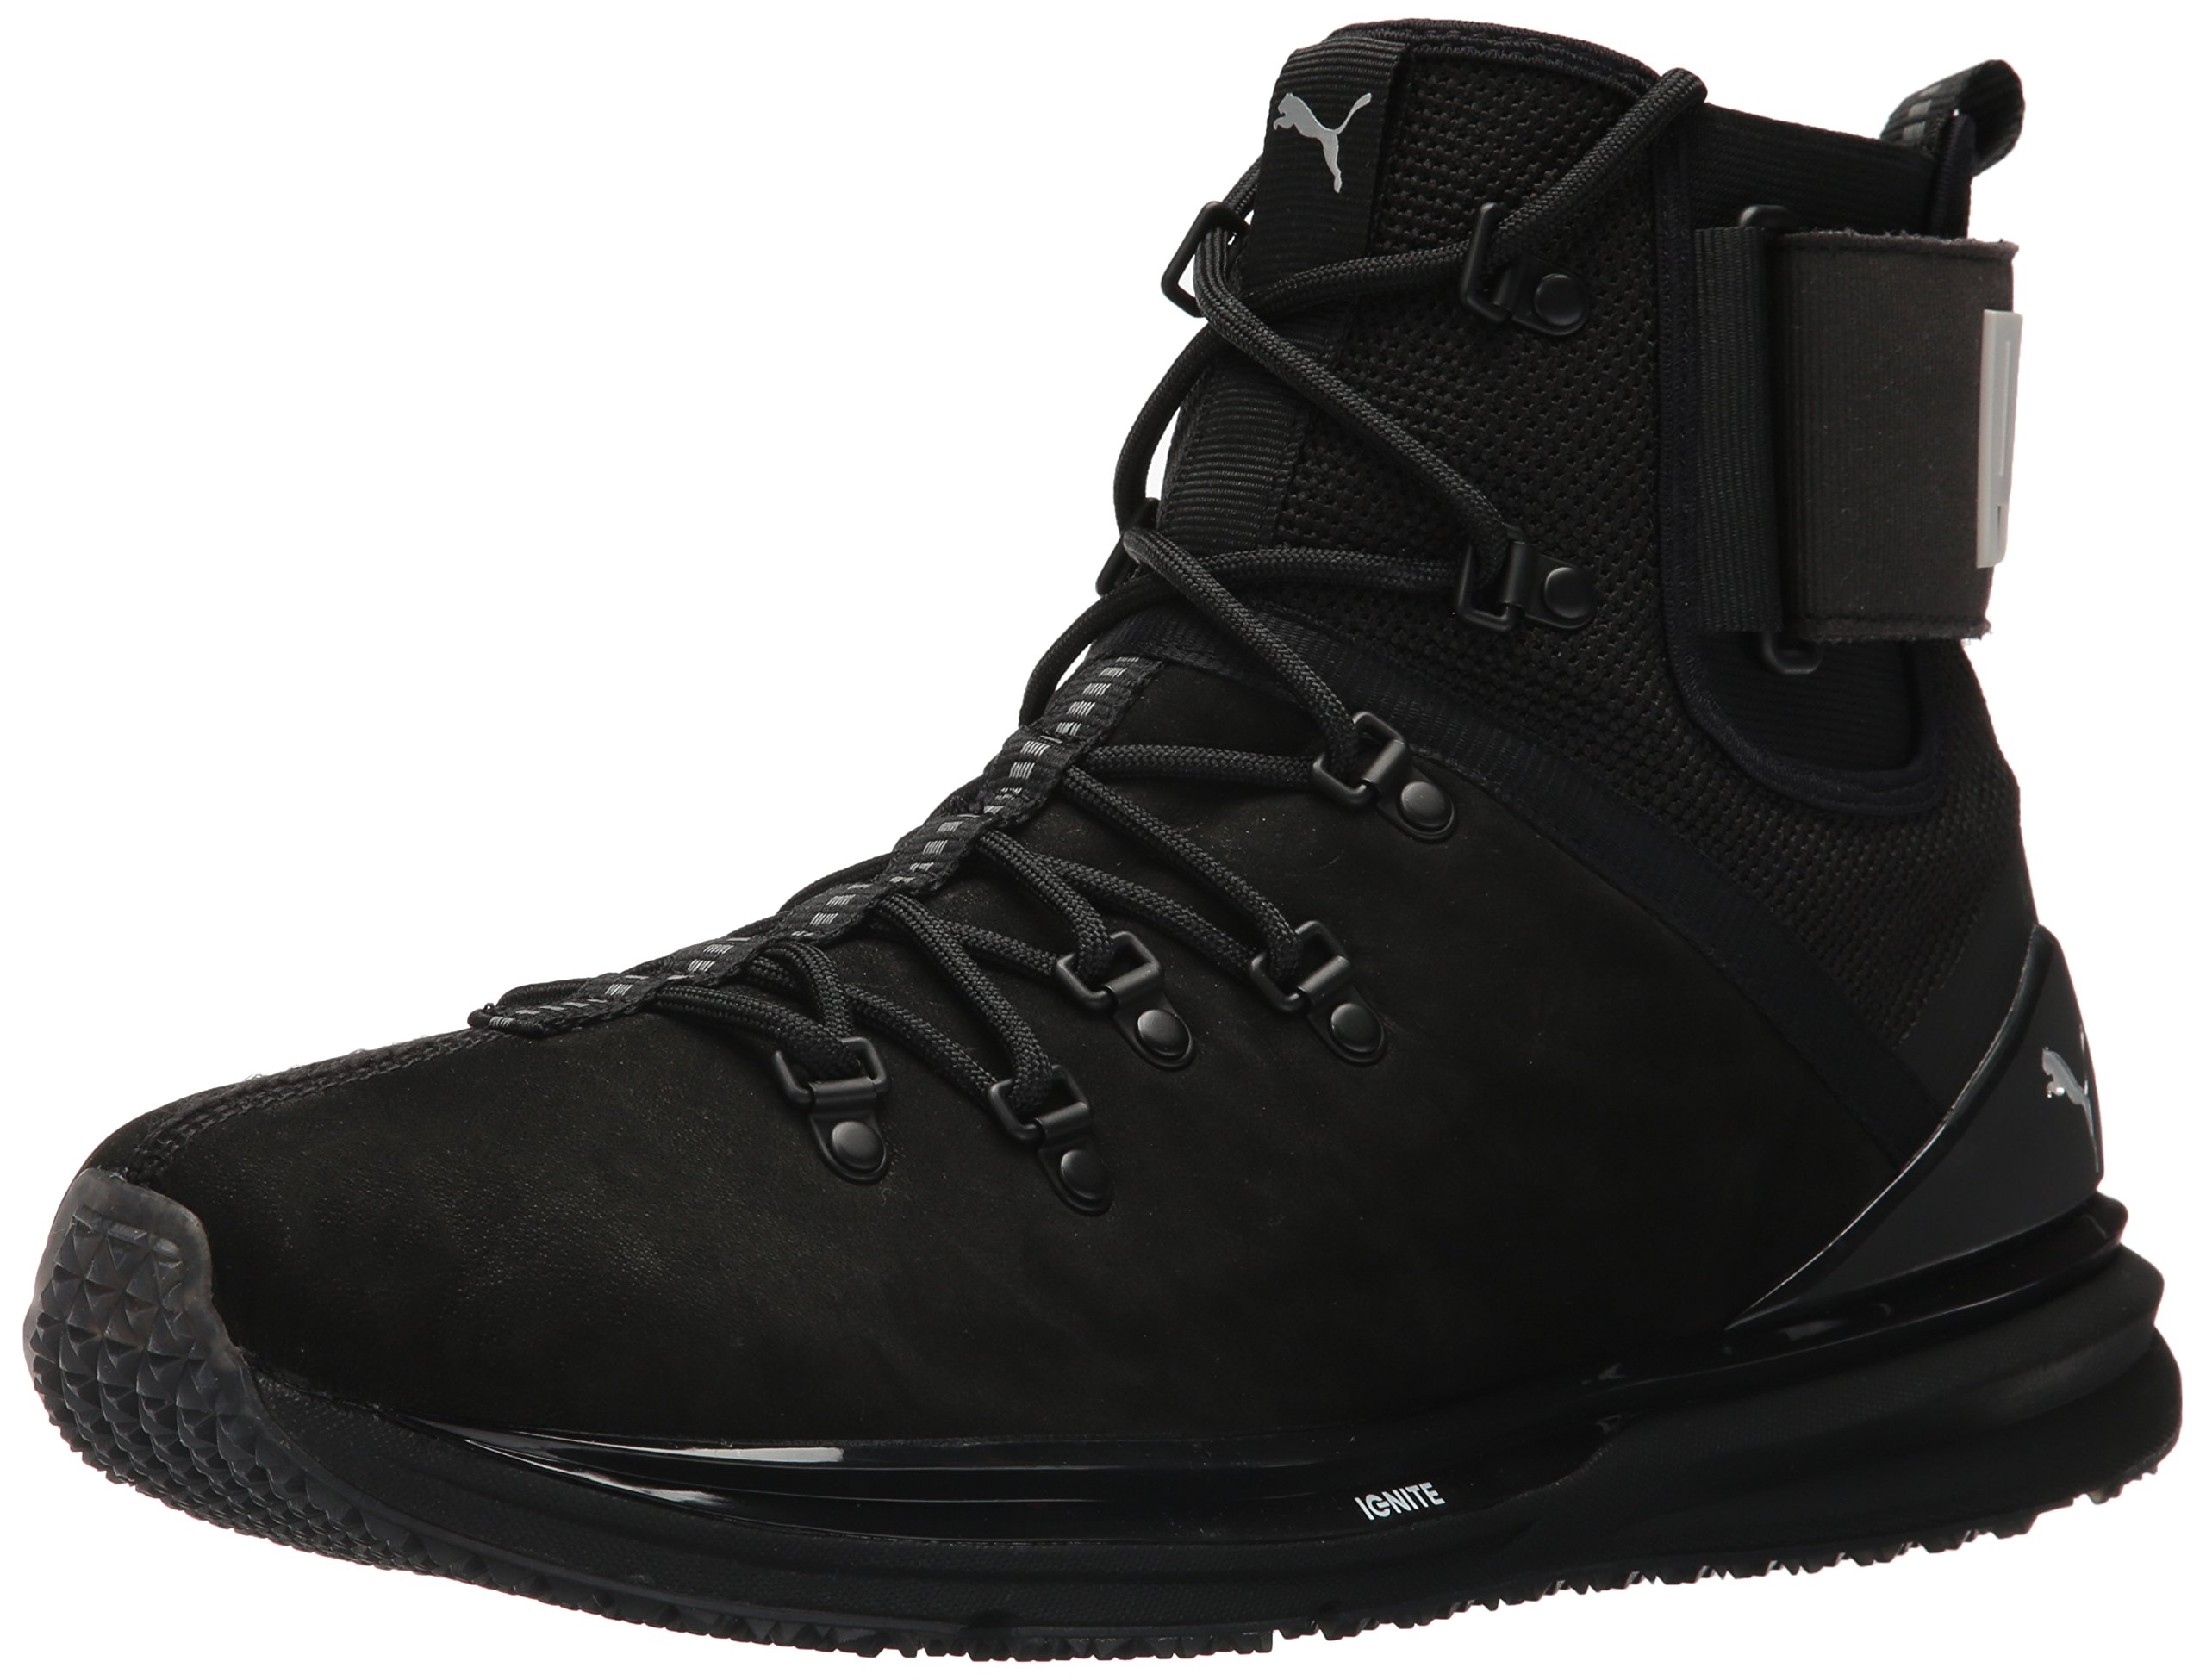 PUMA Men's Ignite Limitless Boot Leather Sneaker, Puma Black-Puma Black, 13 M US